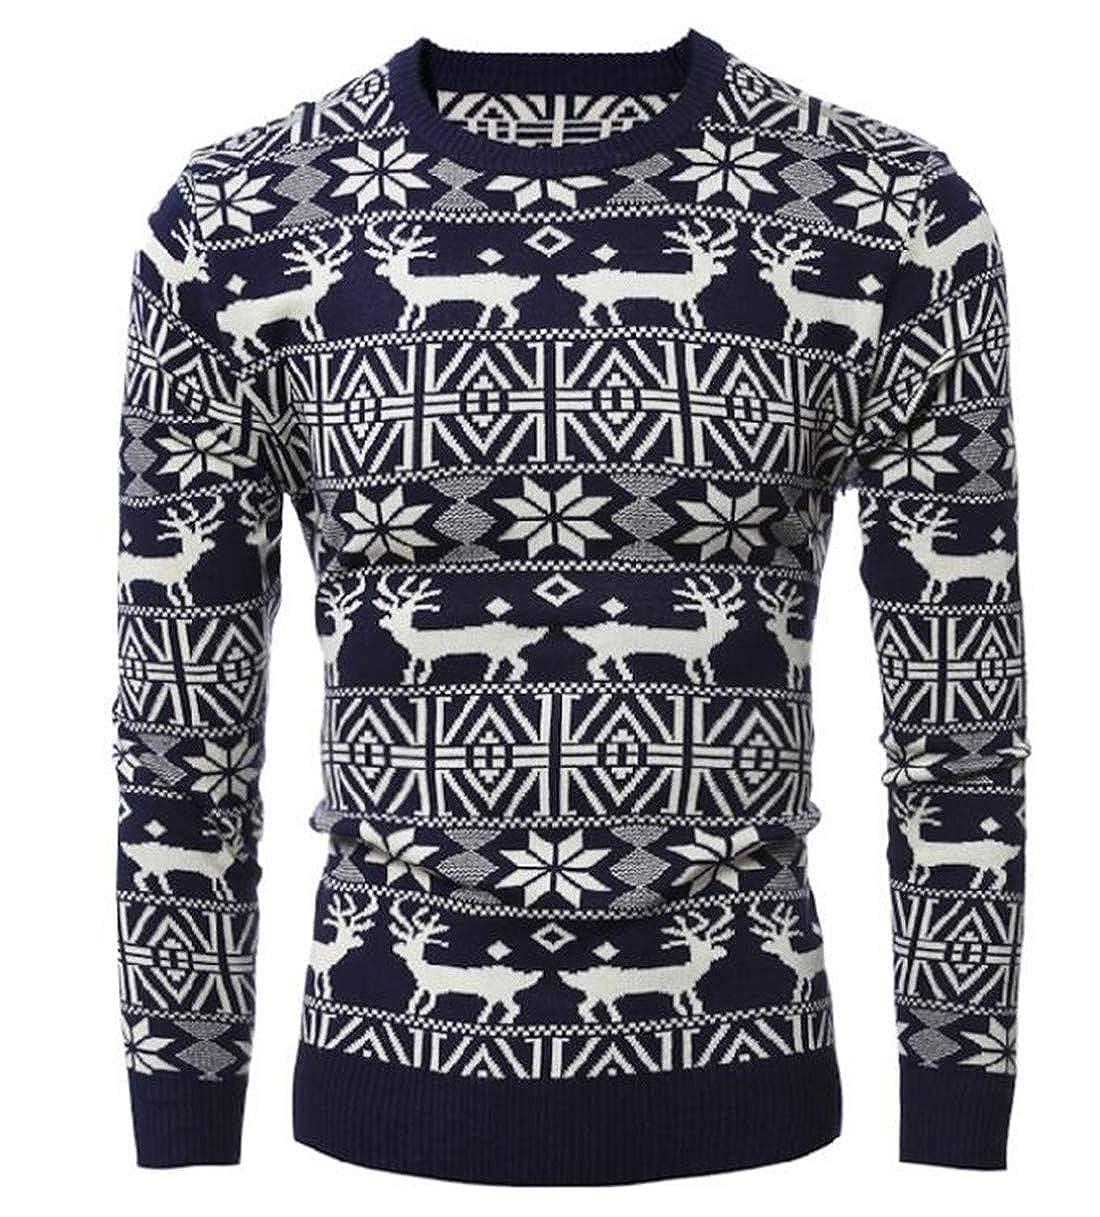 GRMO Men Christmas Xmas Snowflake Print Long Sleeve O-Neck Knit Sweater